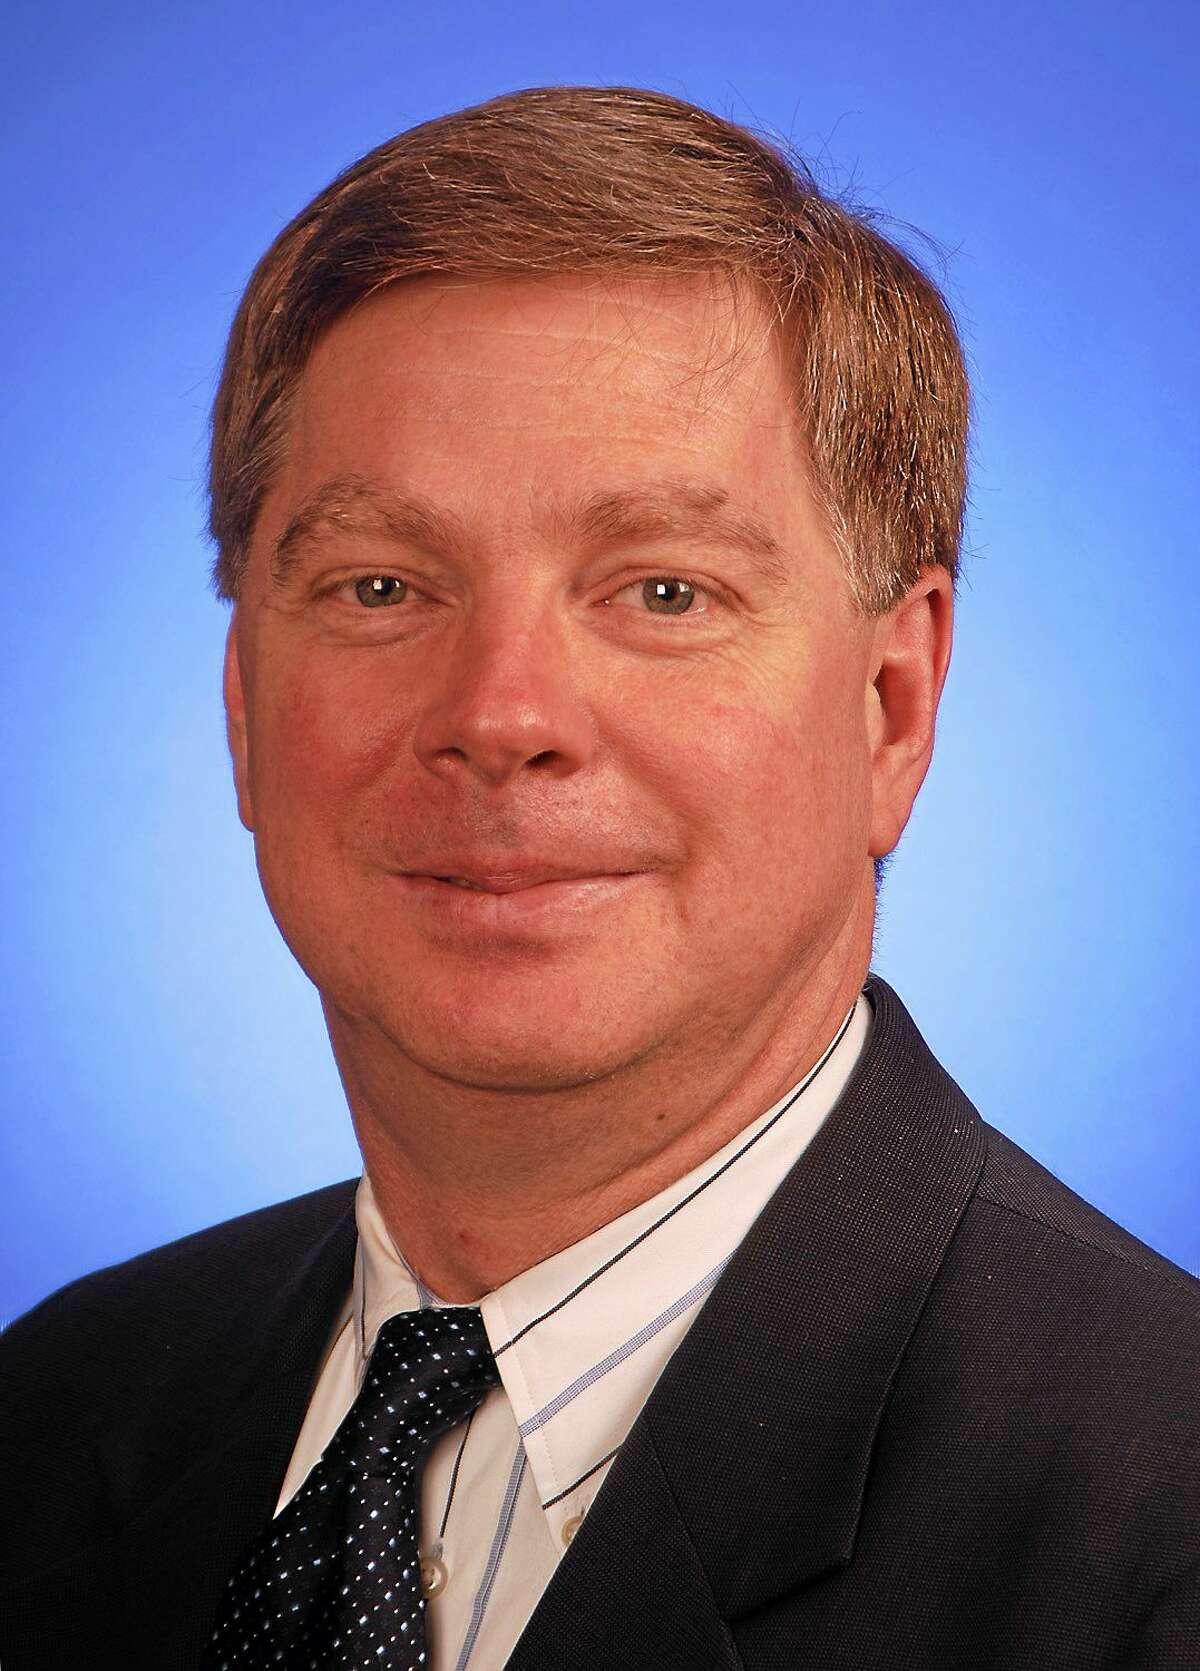 Dr. Daniel J. Diver